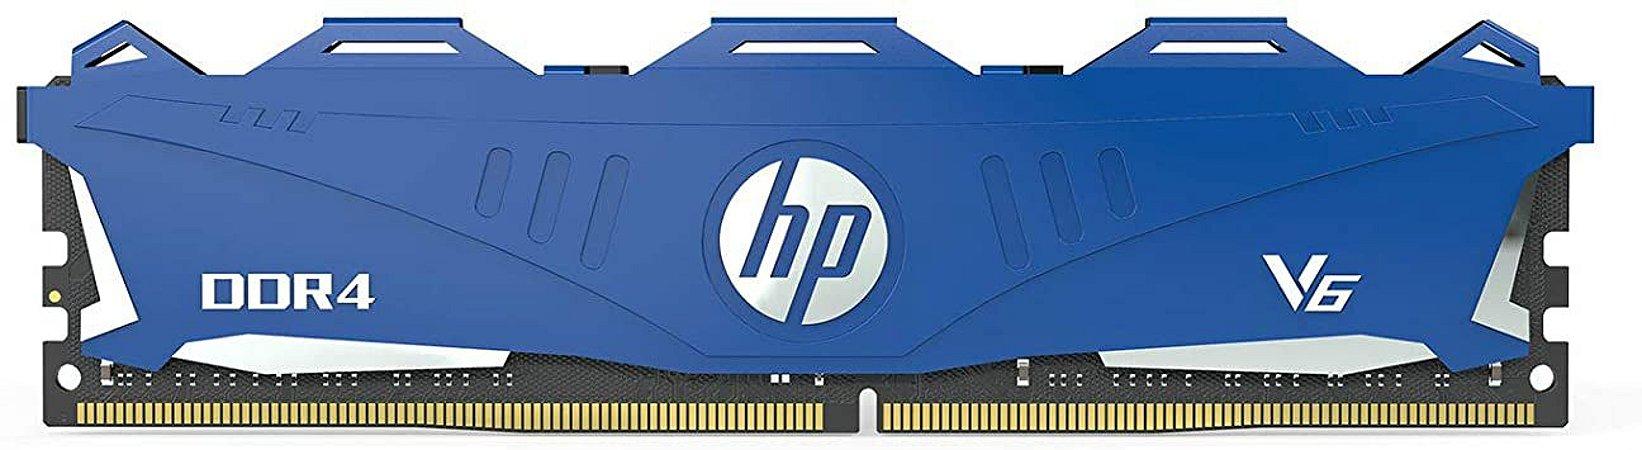 Memória HP V6 Series 8GB DDR4 3000Mhz 7EH64AA - Azul OEM